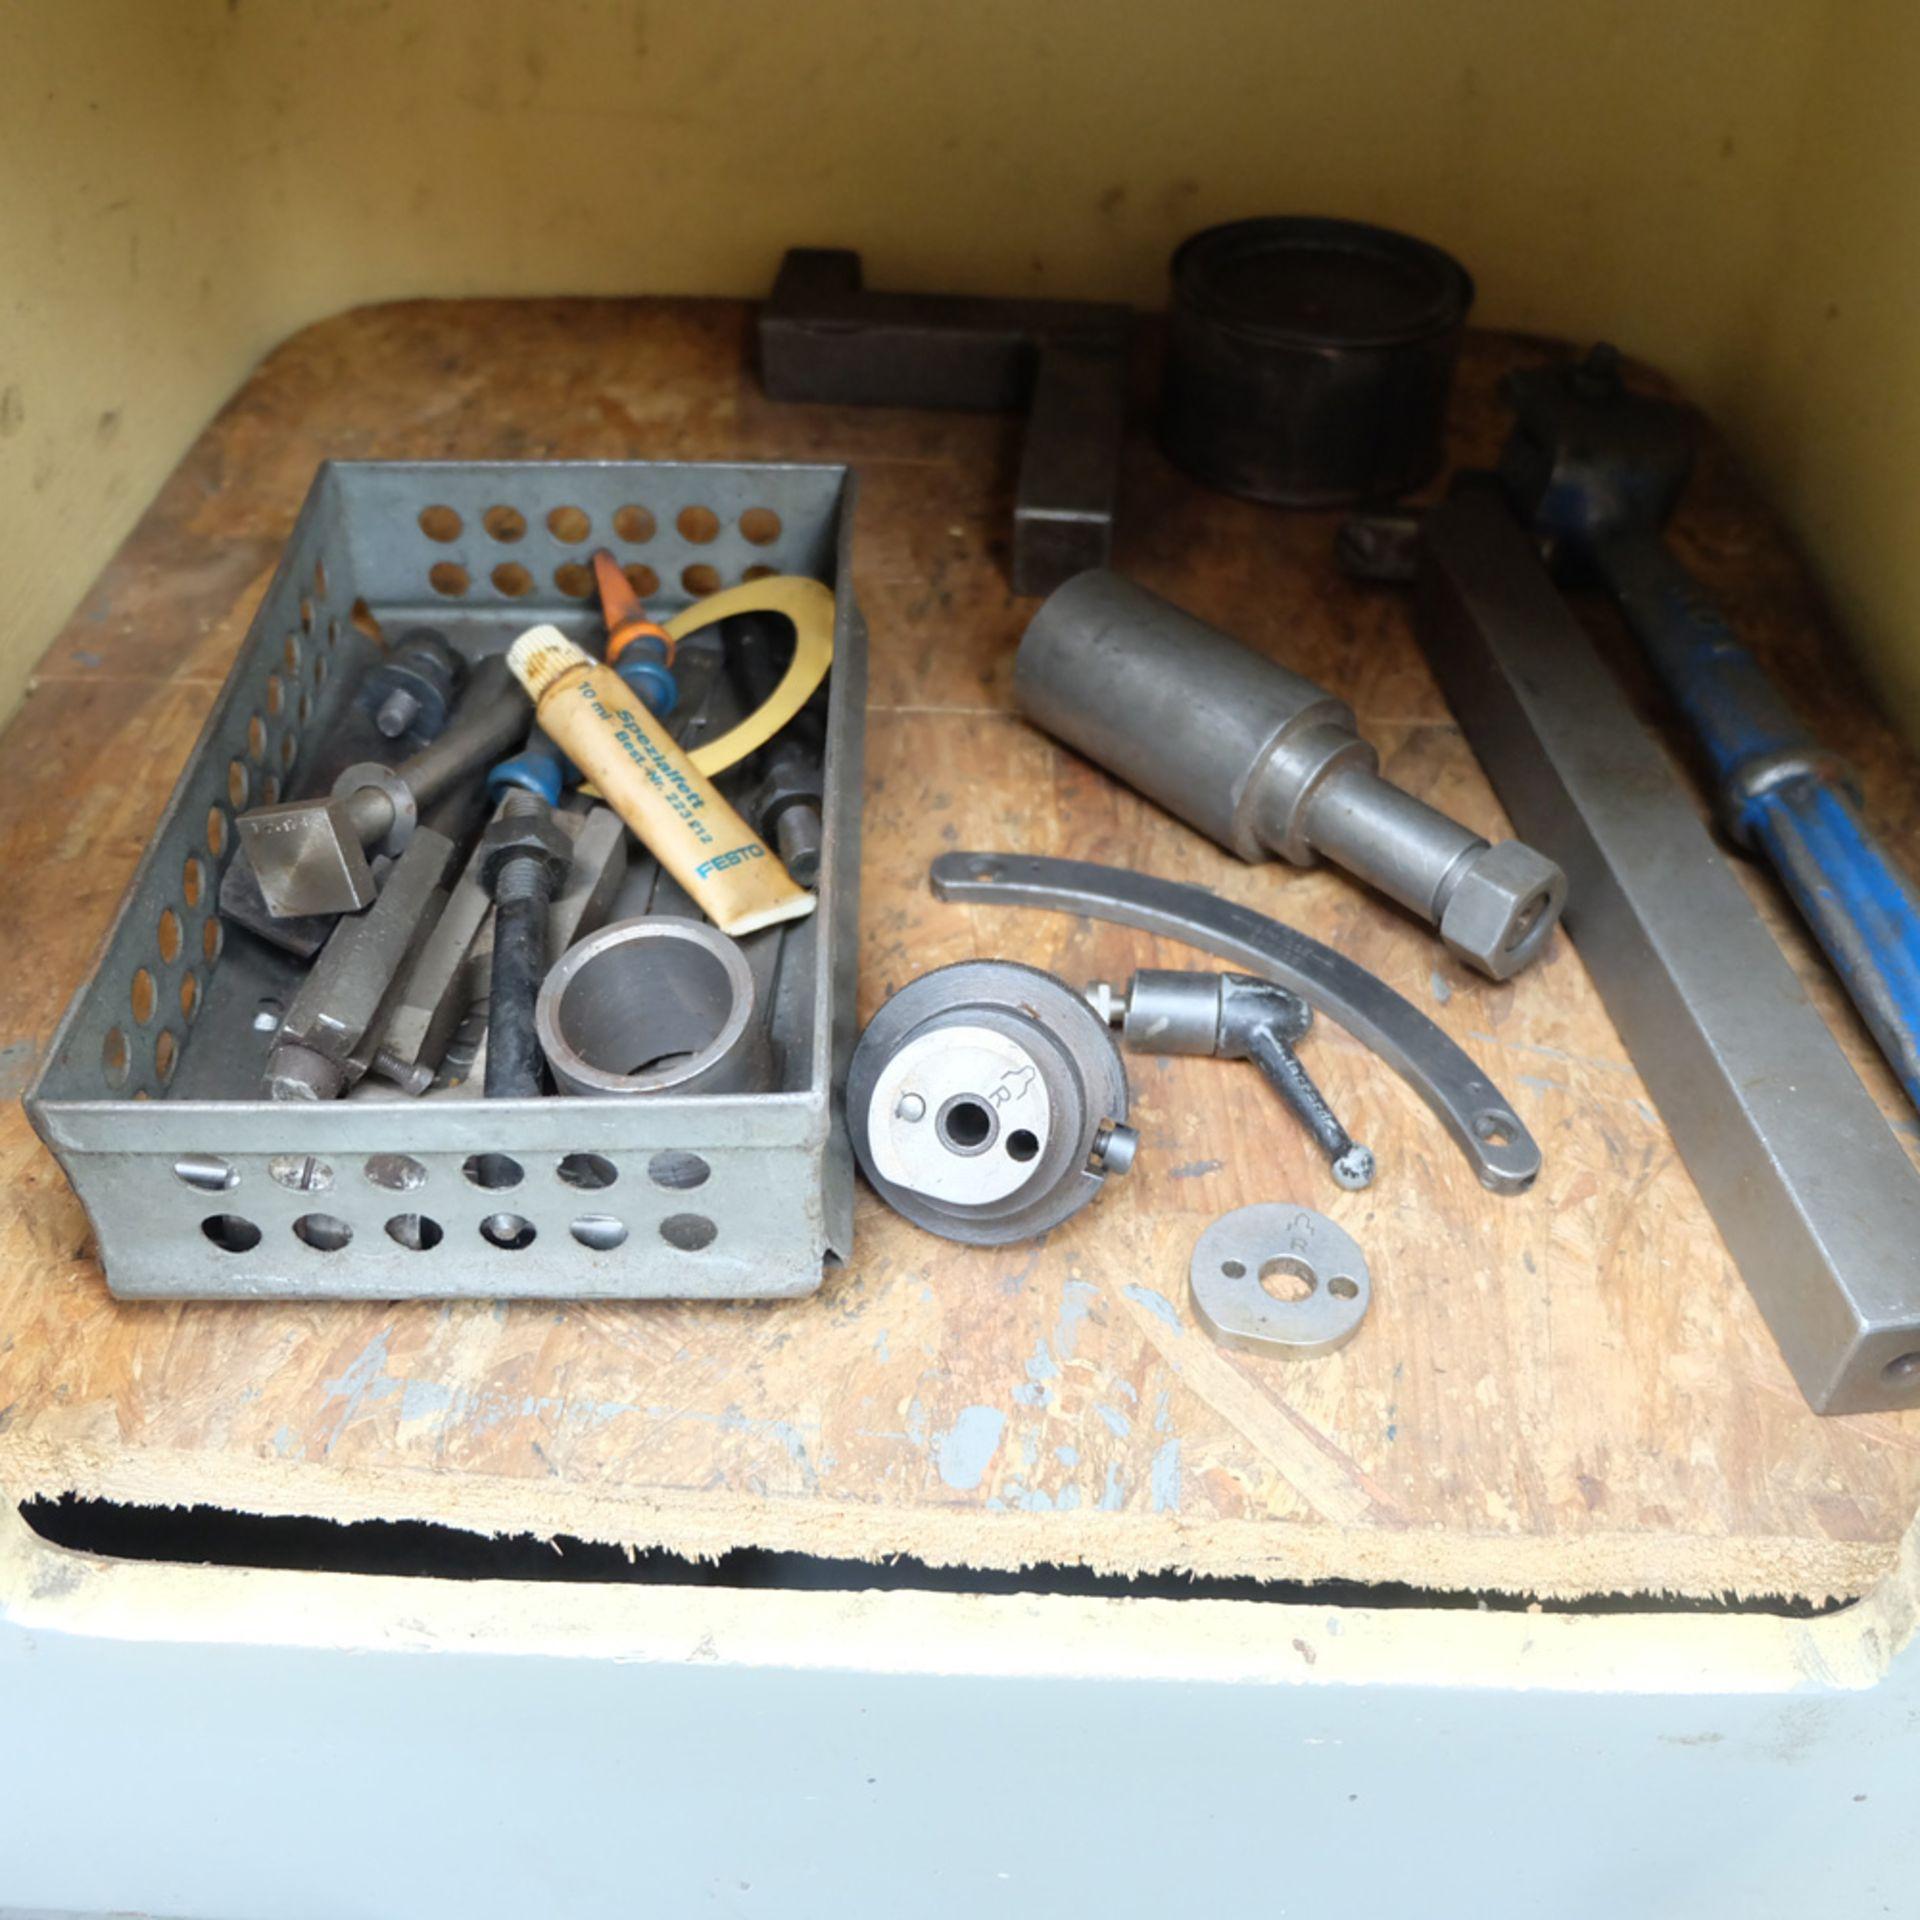 Christen Type 2-32 Twist Drill Grinding Machine. - Image 13 of 14